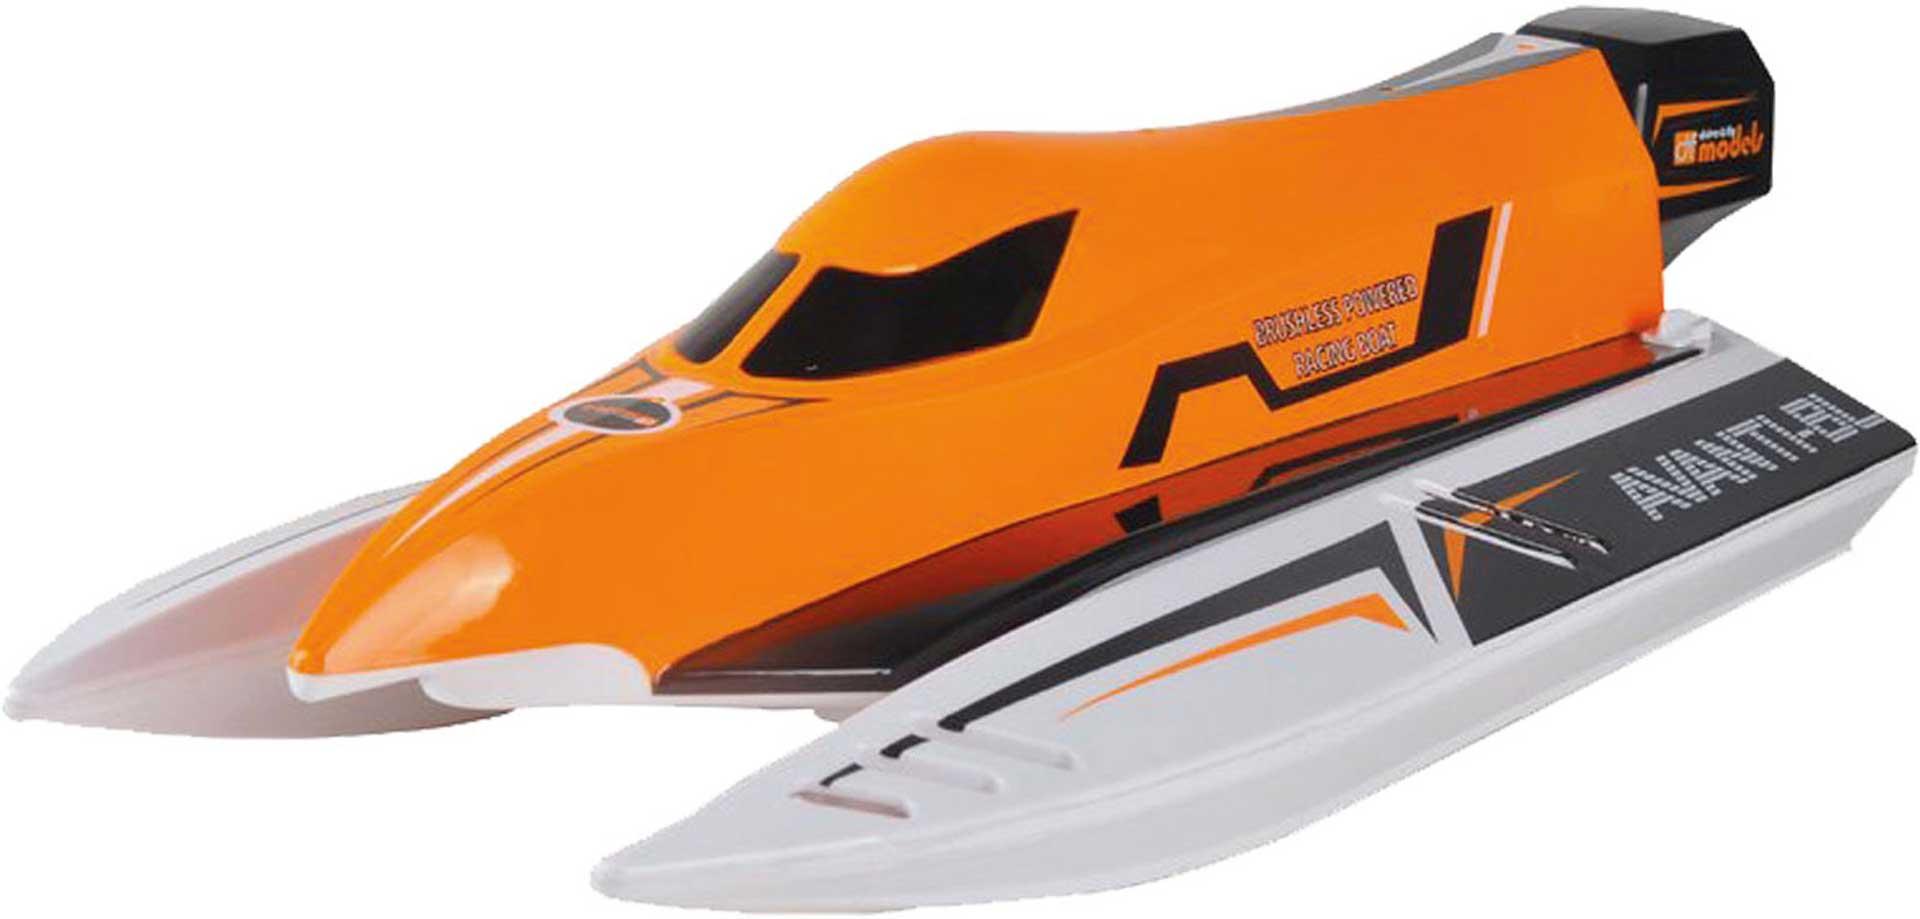 DRIVE & FLY MODELS AVANTI-BL BRUSHLESS RENNBOOT RTR